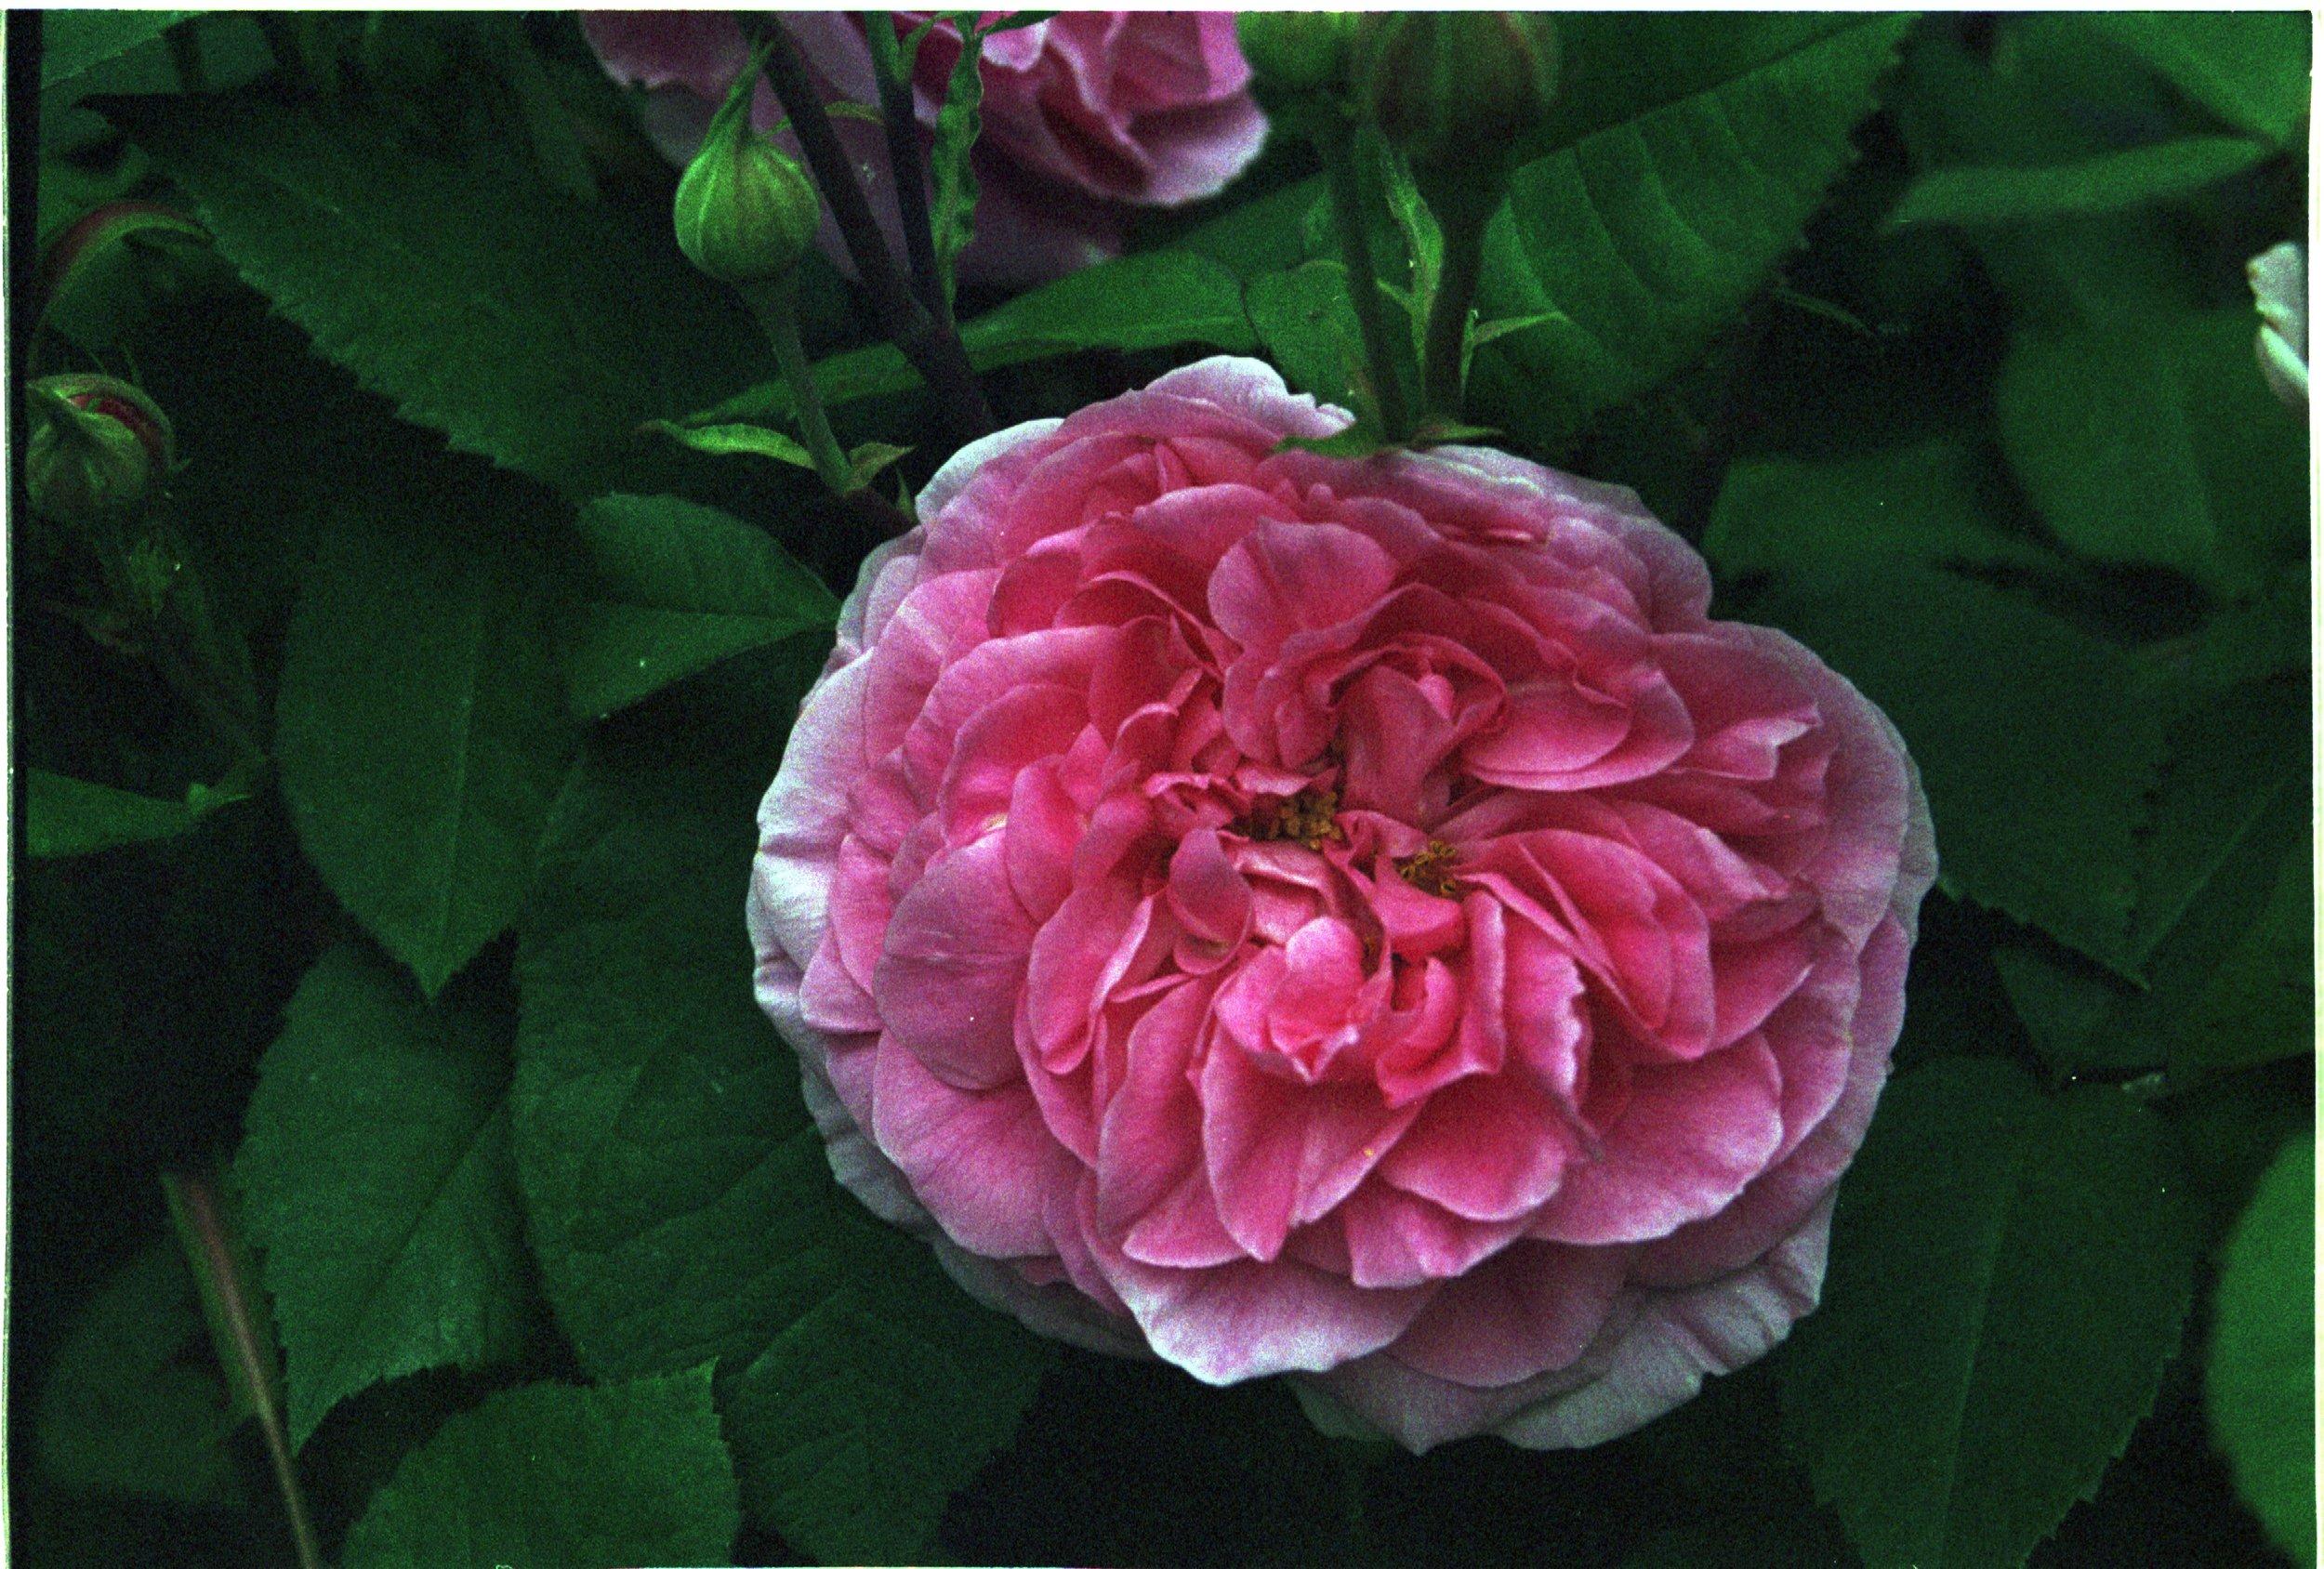 flower, rose, Cruzin' Thru Gardens